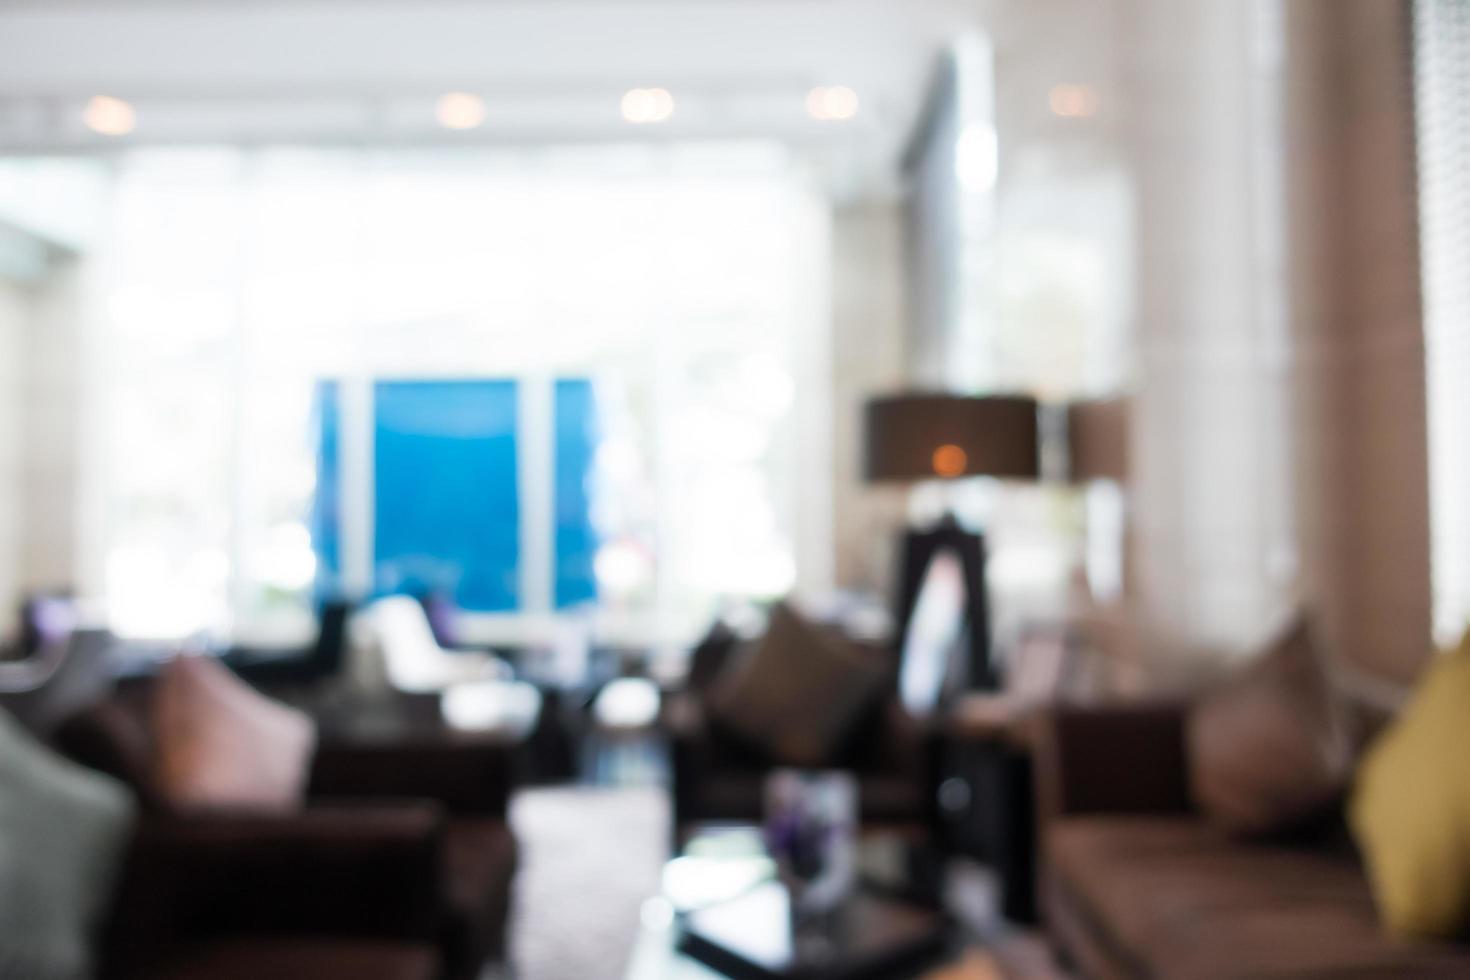 lobby del hotel borroso abstracto foto